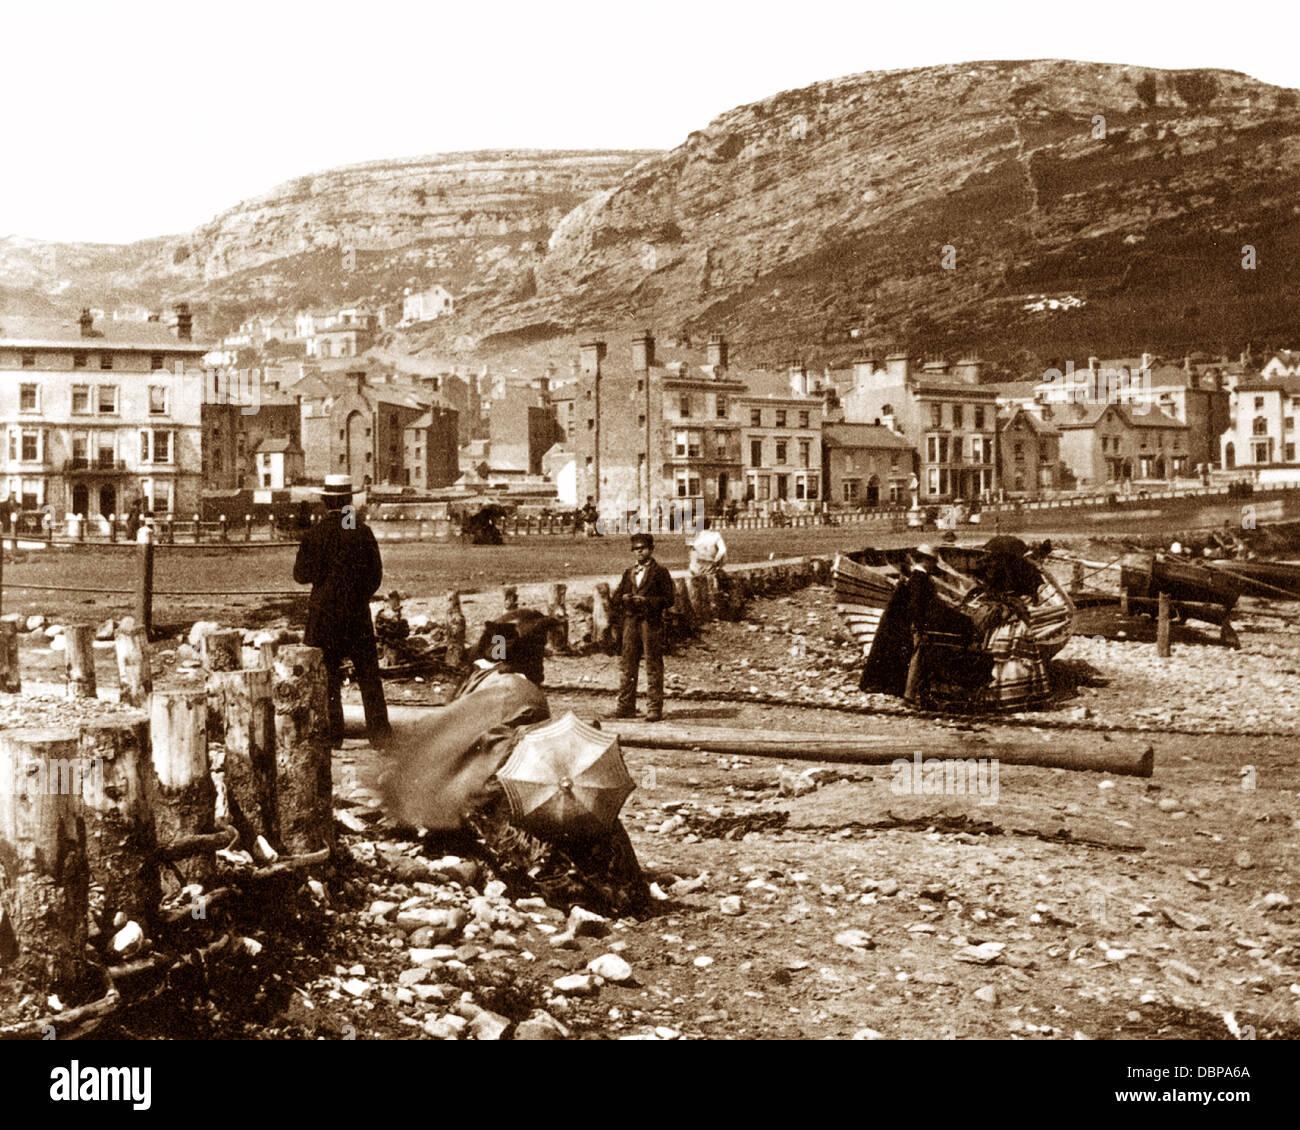 Llandudno Beach in the 1860s - Stock Image